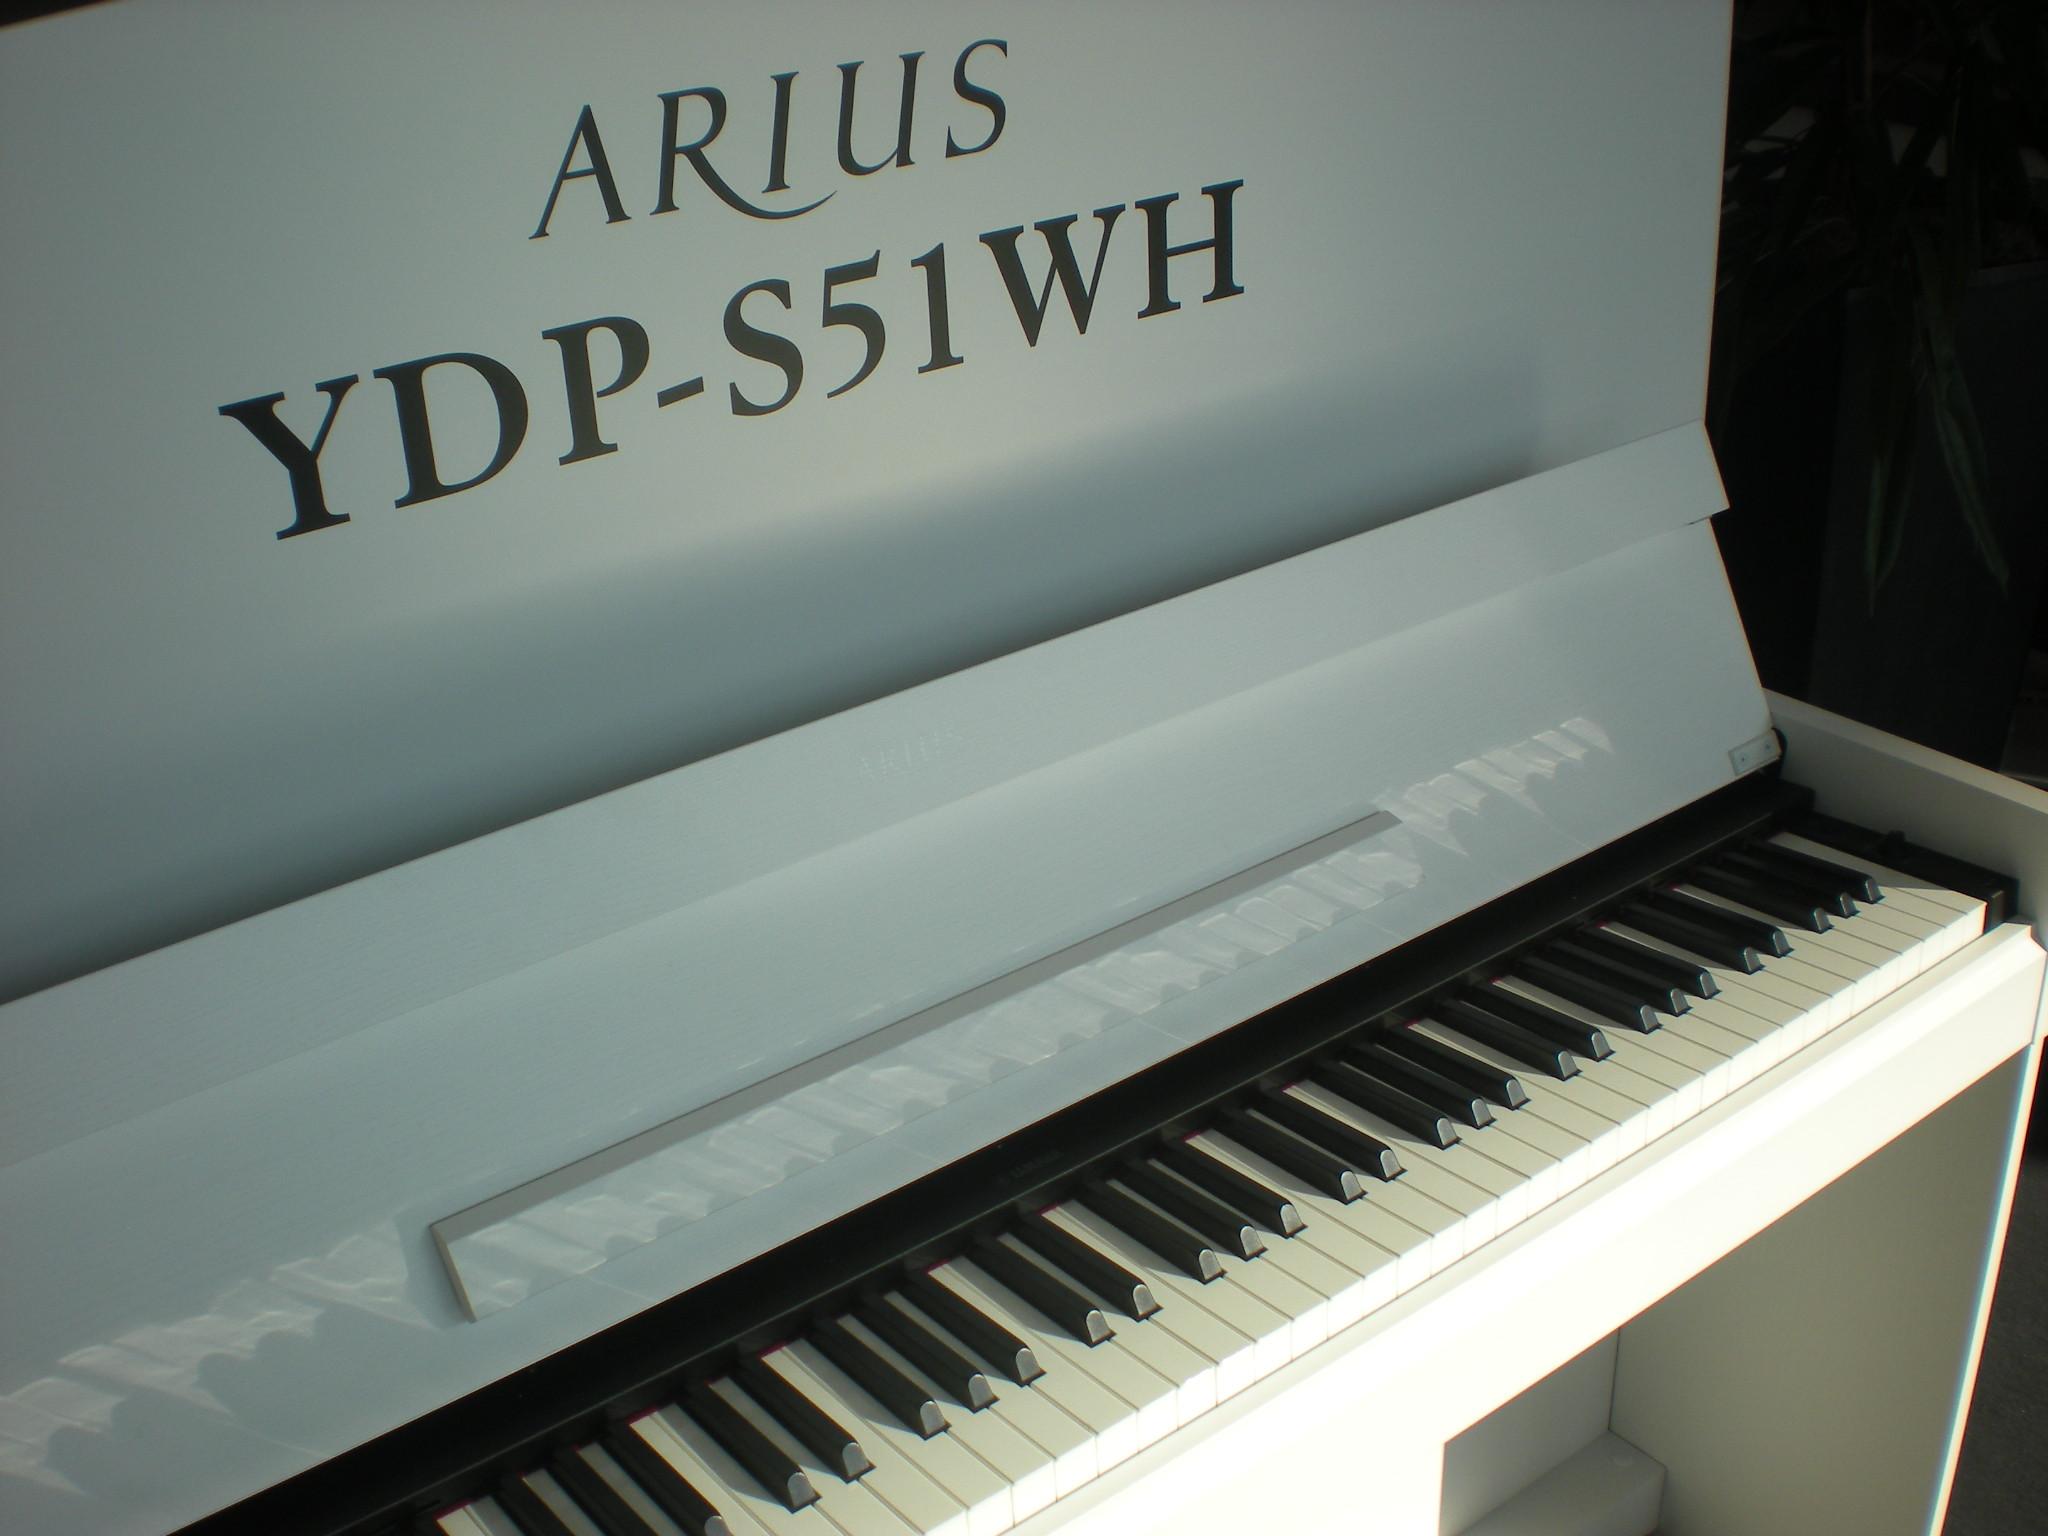 Yamaha_Arius_YDP_S51.JPG